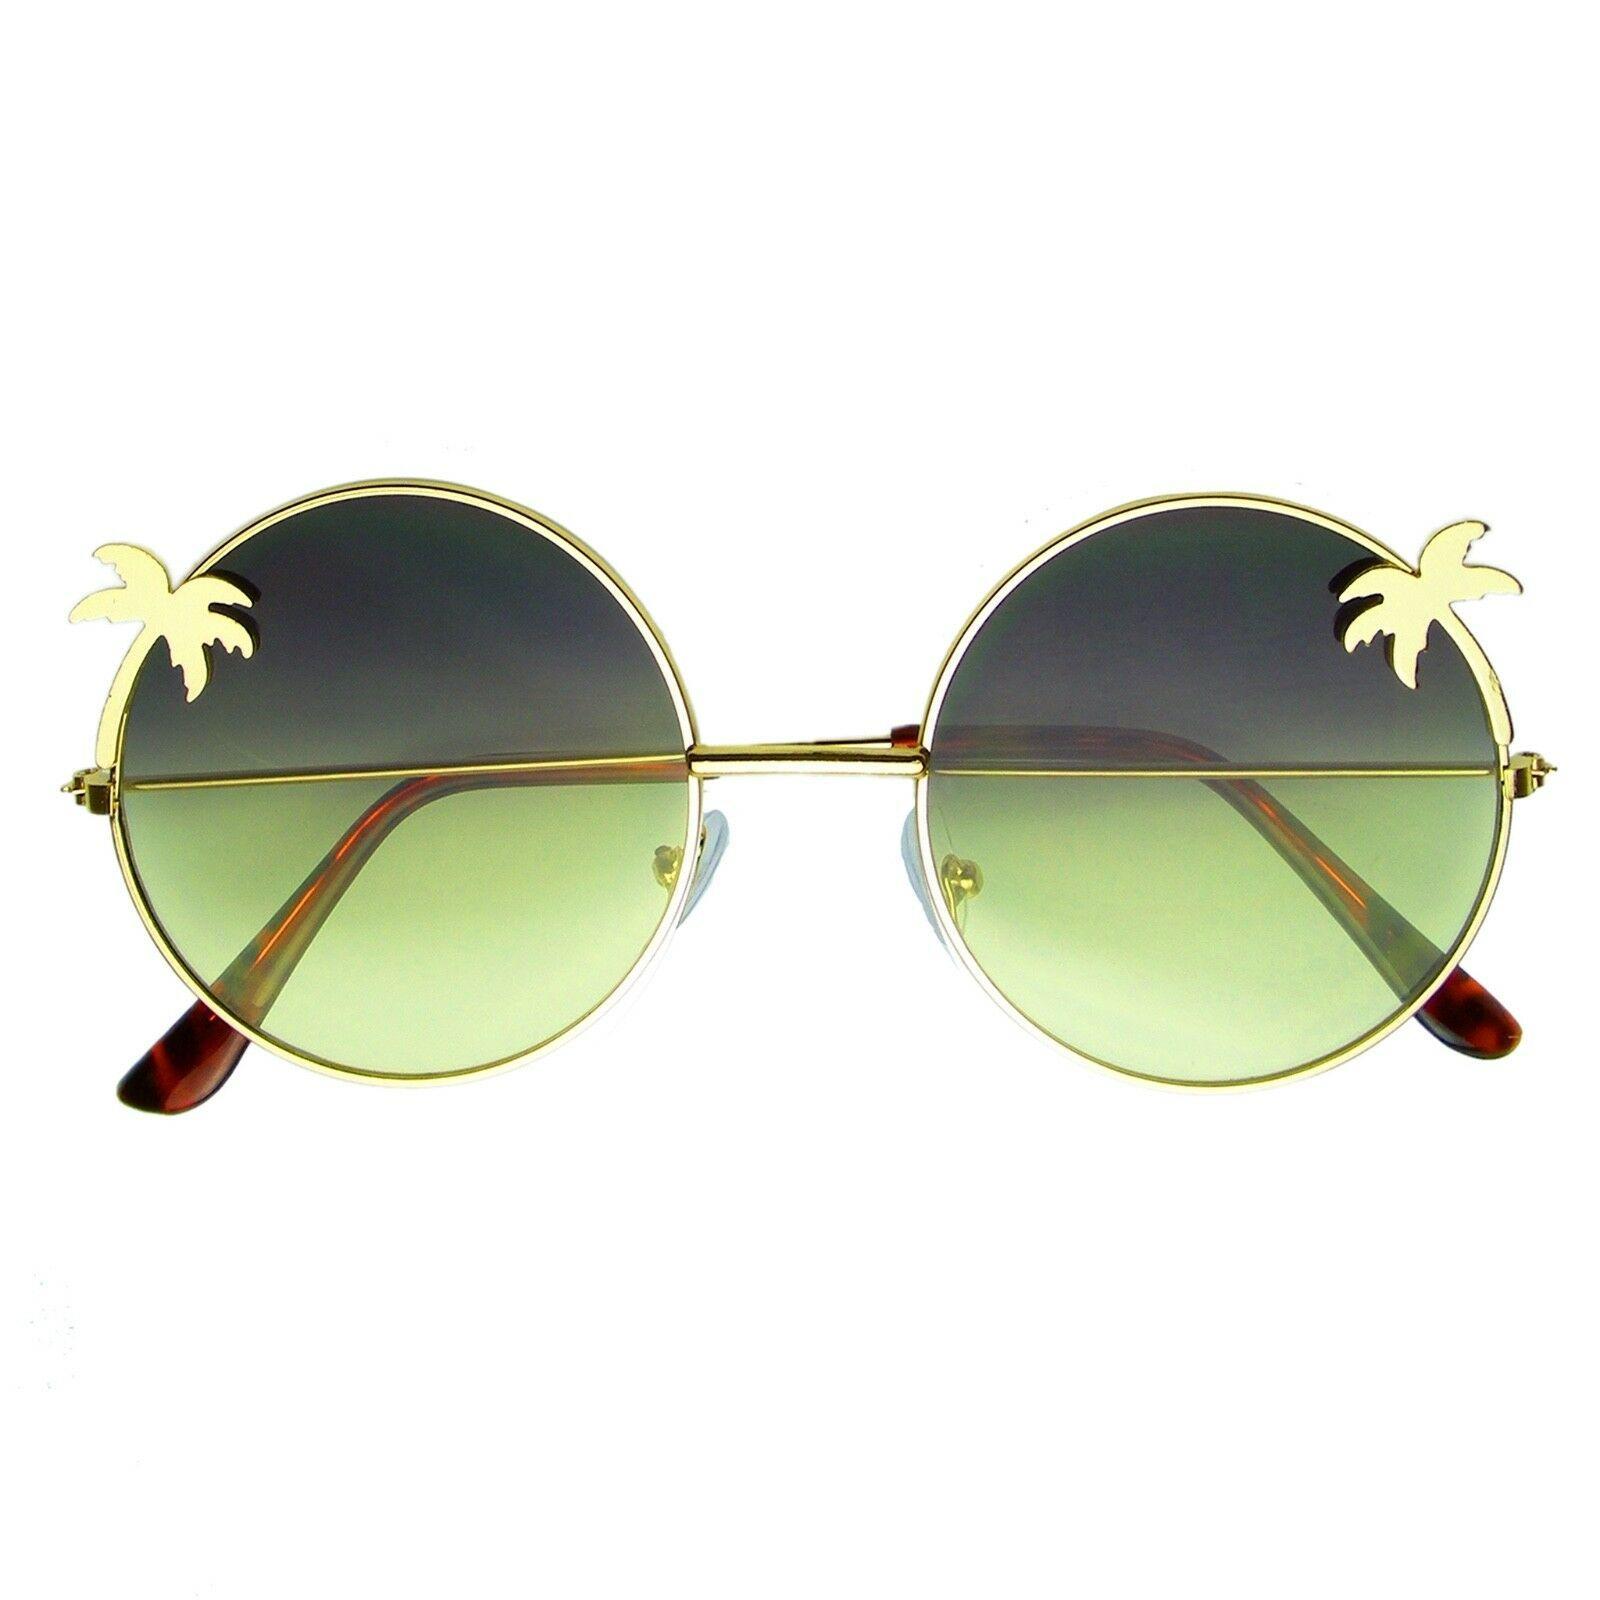 Vintage Retro Round Sun Glasses Hippie Boho Sunglasses image 6